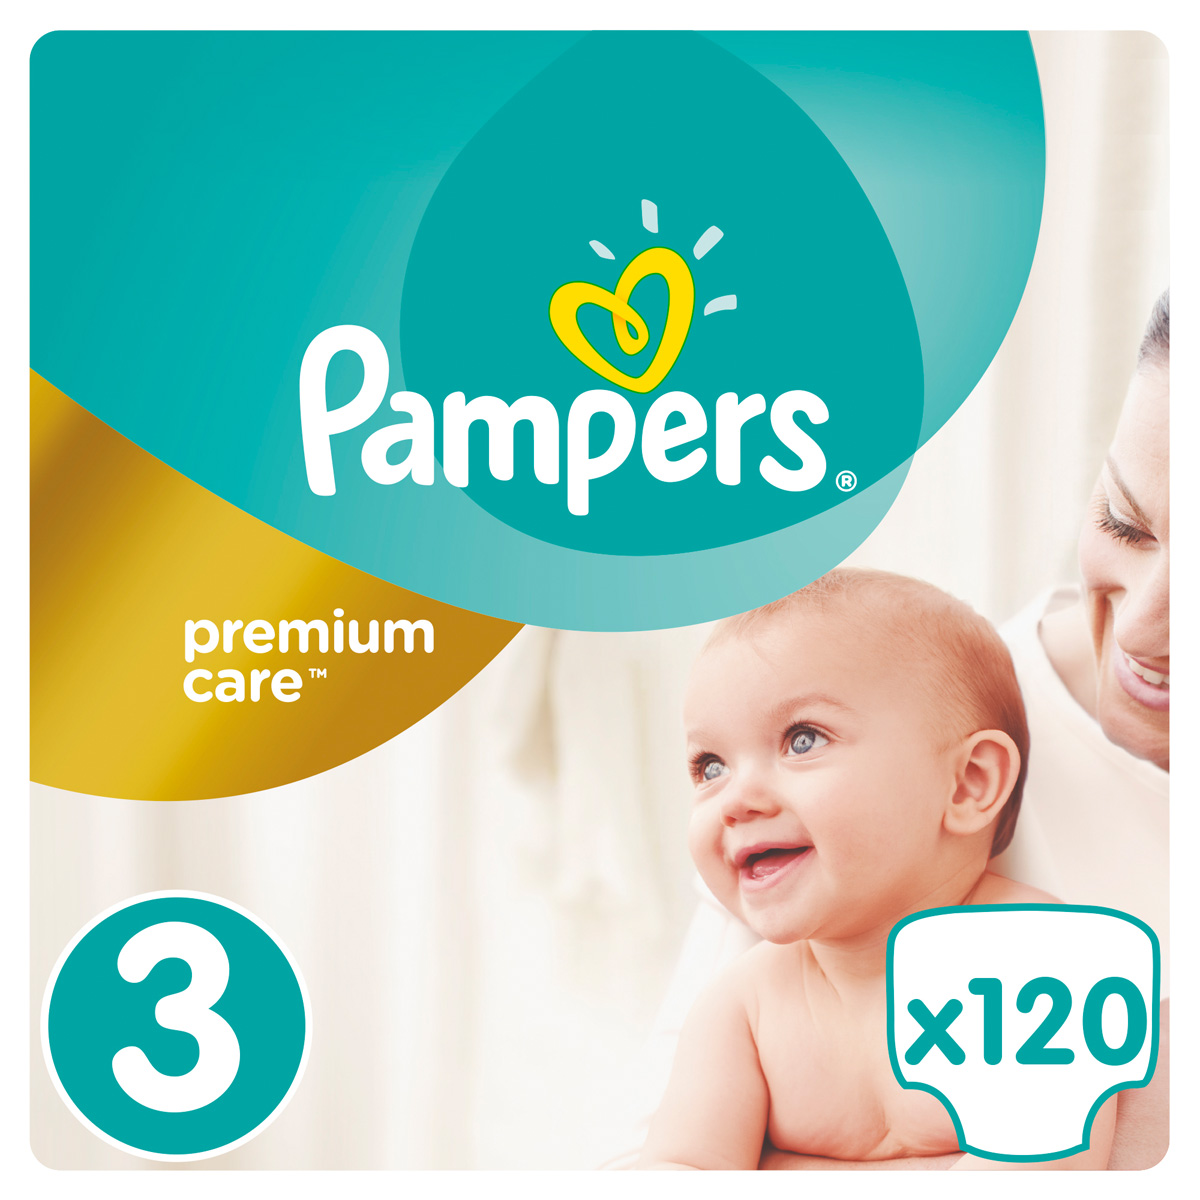 Pampers Подгузники Premium Care 5-9 кг (размер 3) 120 шт подгузники детские pampers подгузники pampers premium care 2 5 кг 1 размер 88 шт